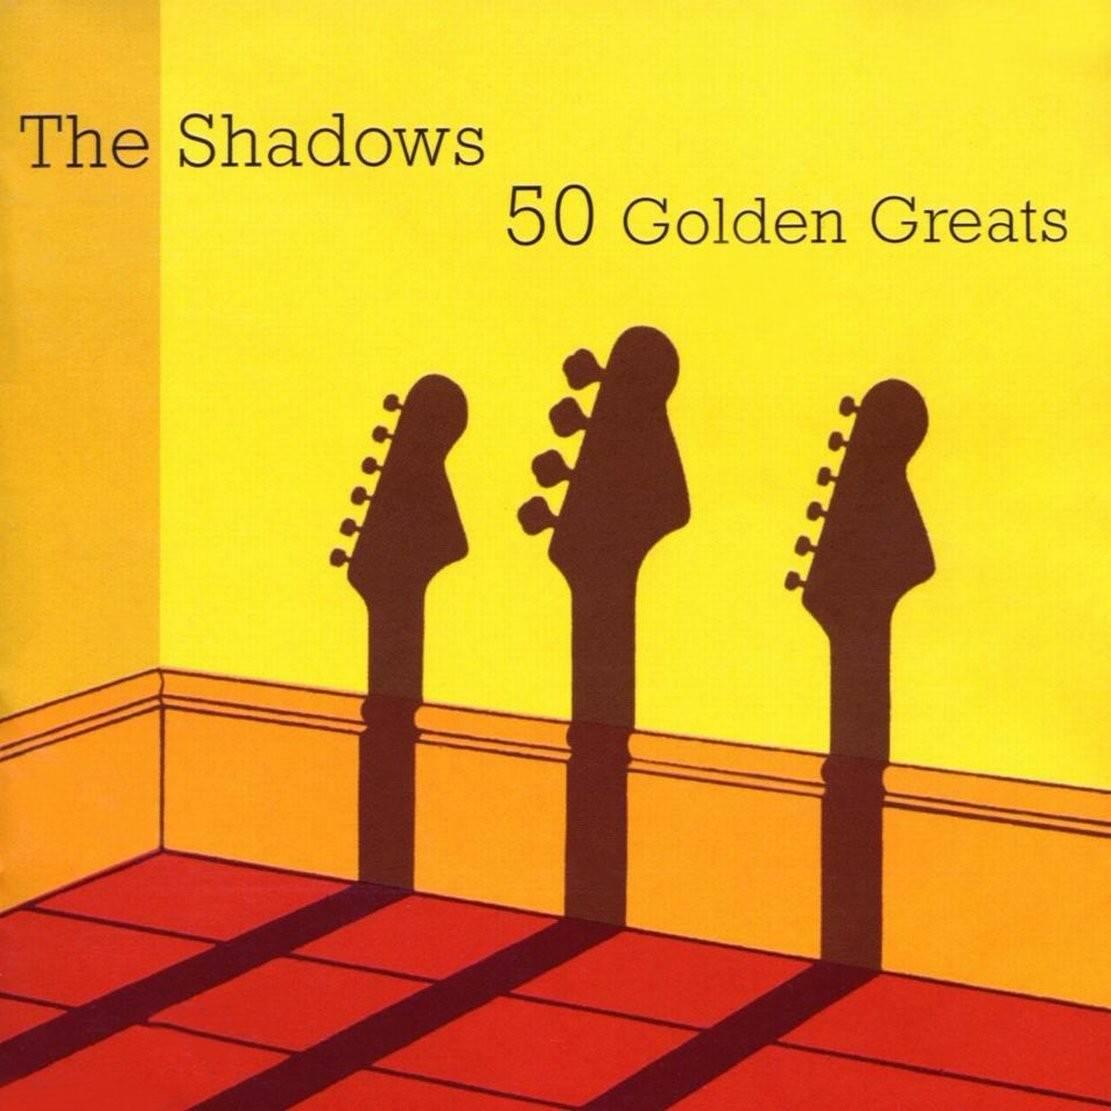 THE SHADOWS - 50 Golden Greats